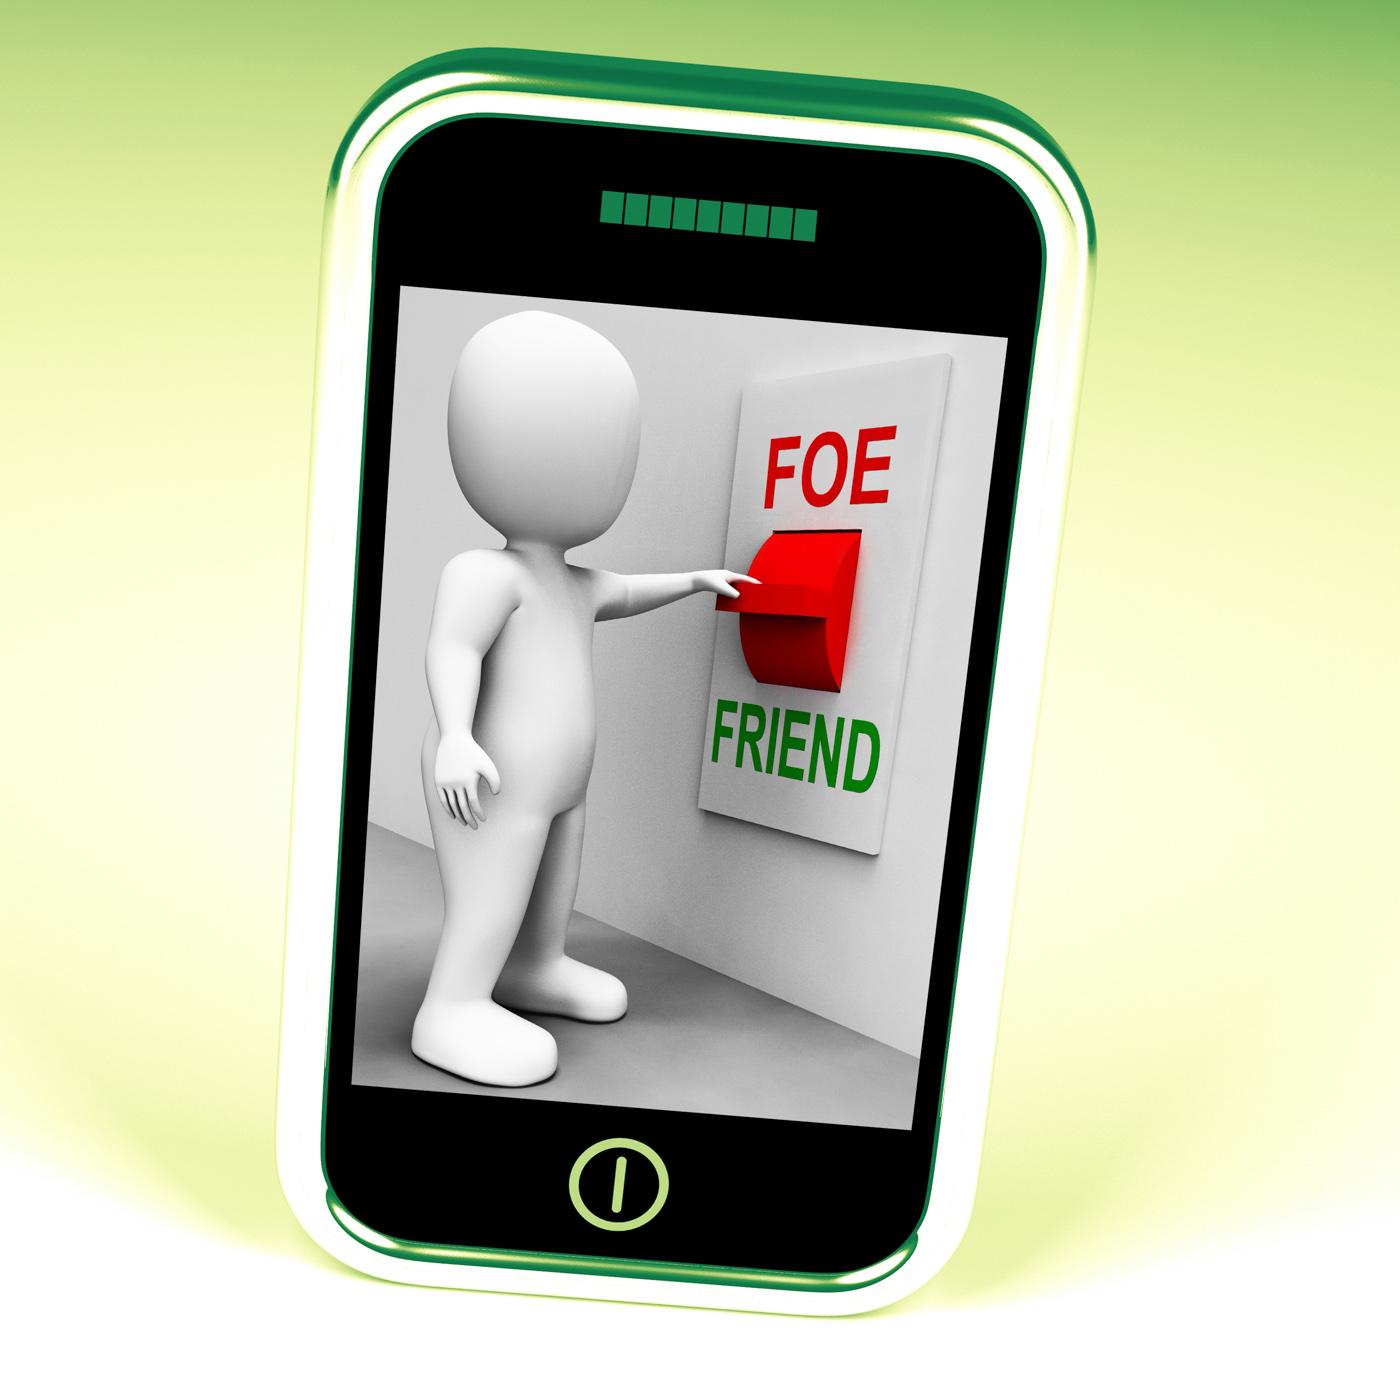 Friend foe switch shows ally or enemy photo